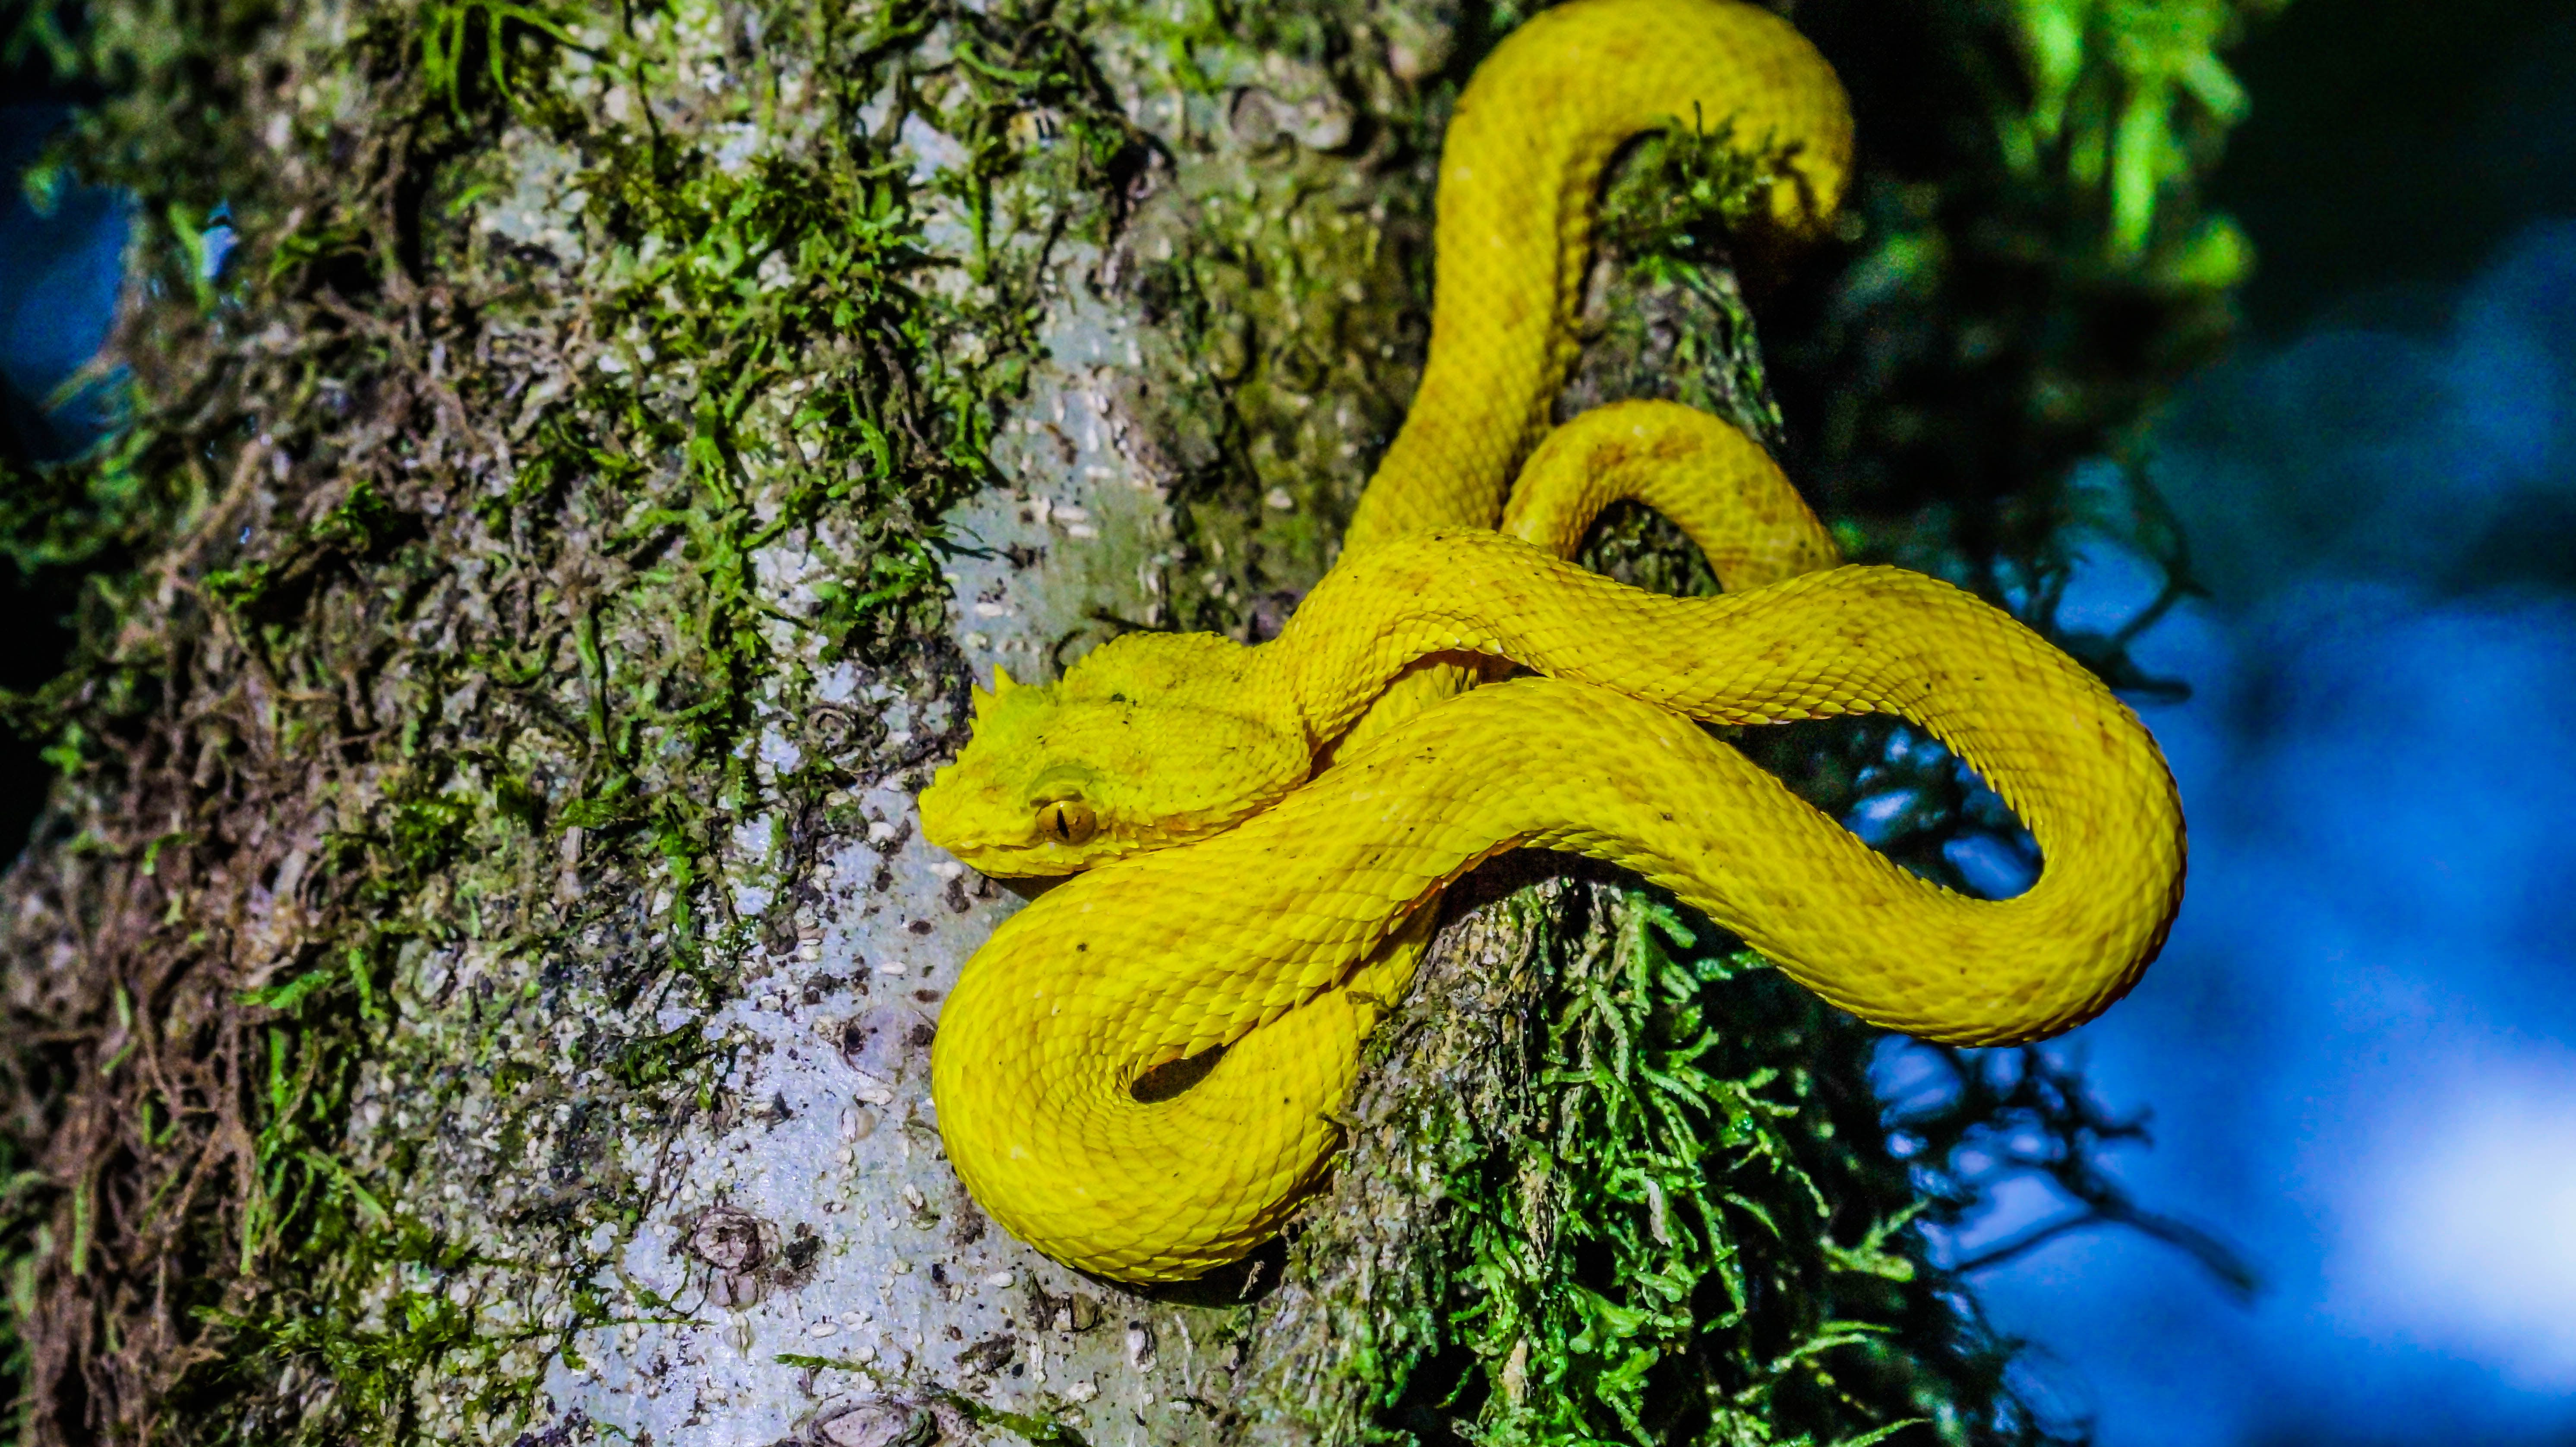 Snake at Mistico Park